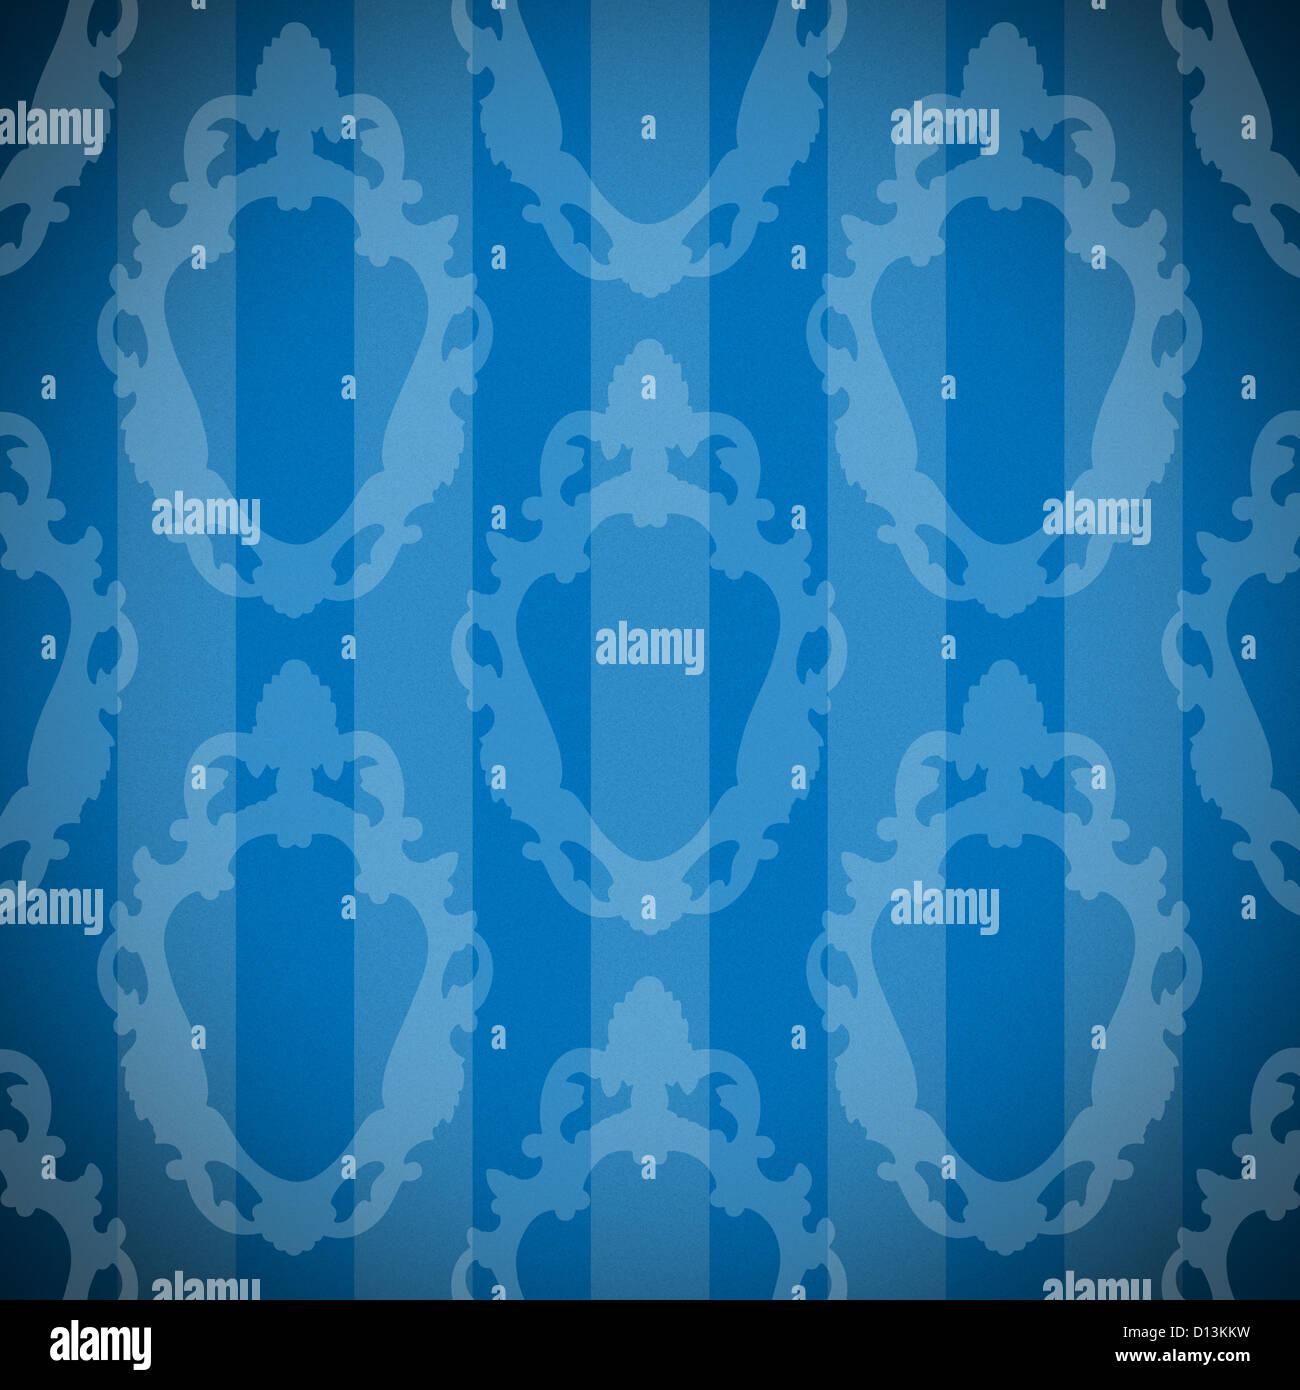 wallpaper pattern - Stock Image